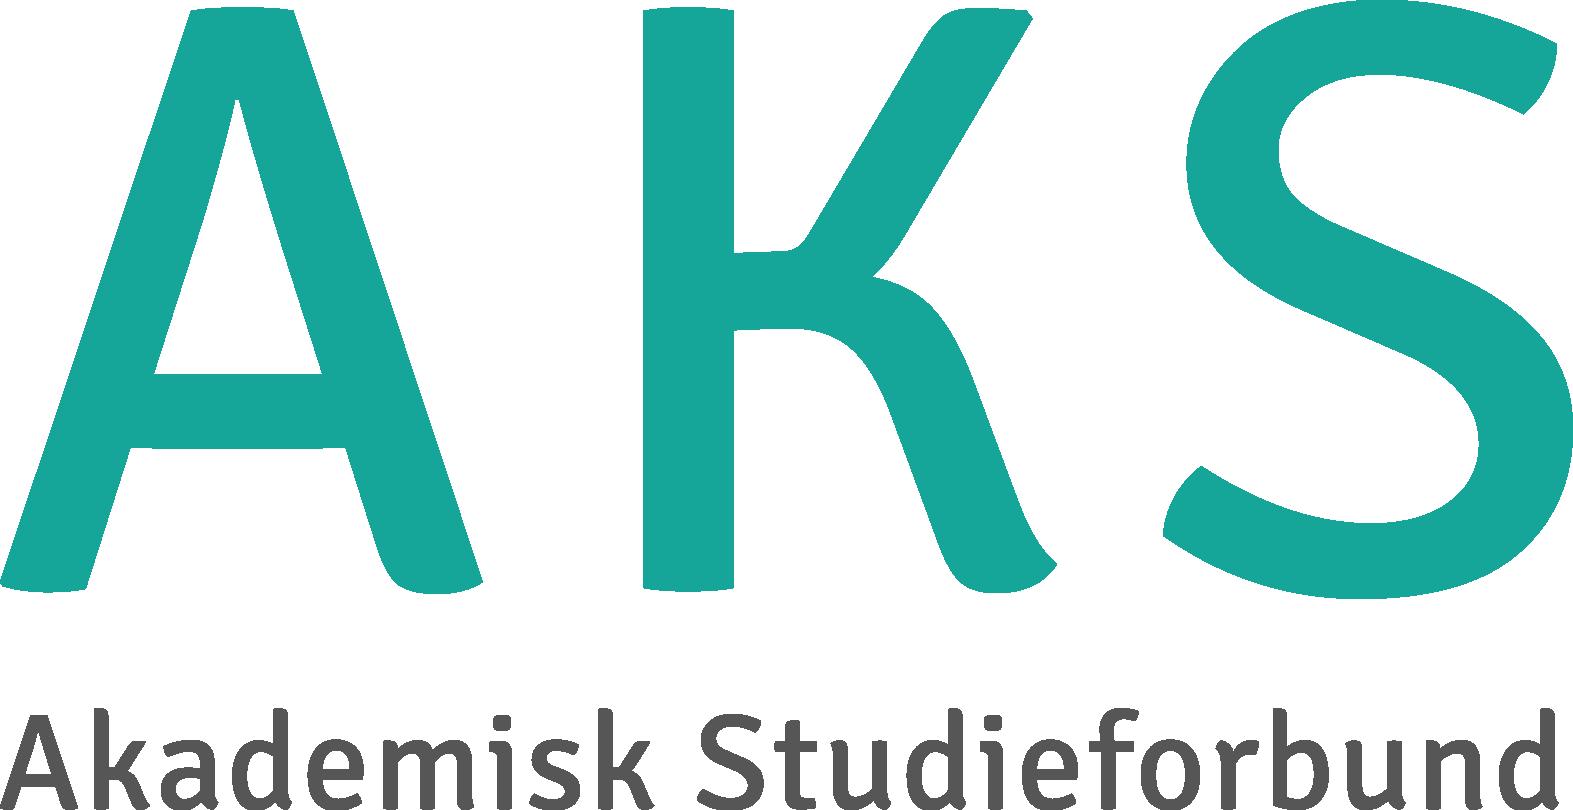 Aks_logo_RGB.png